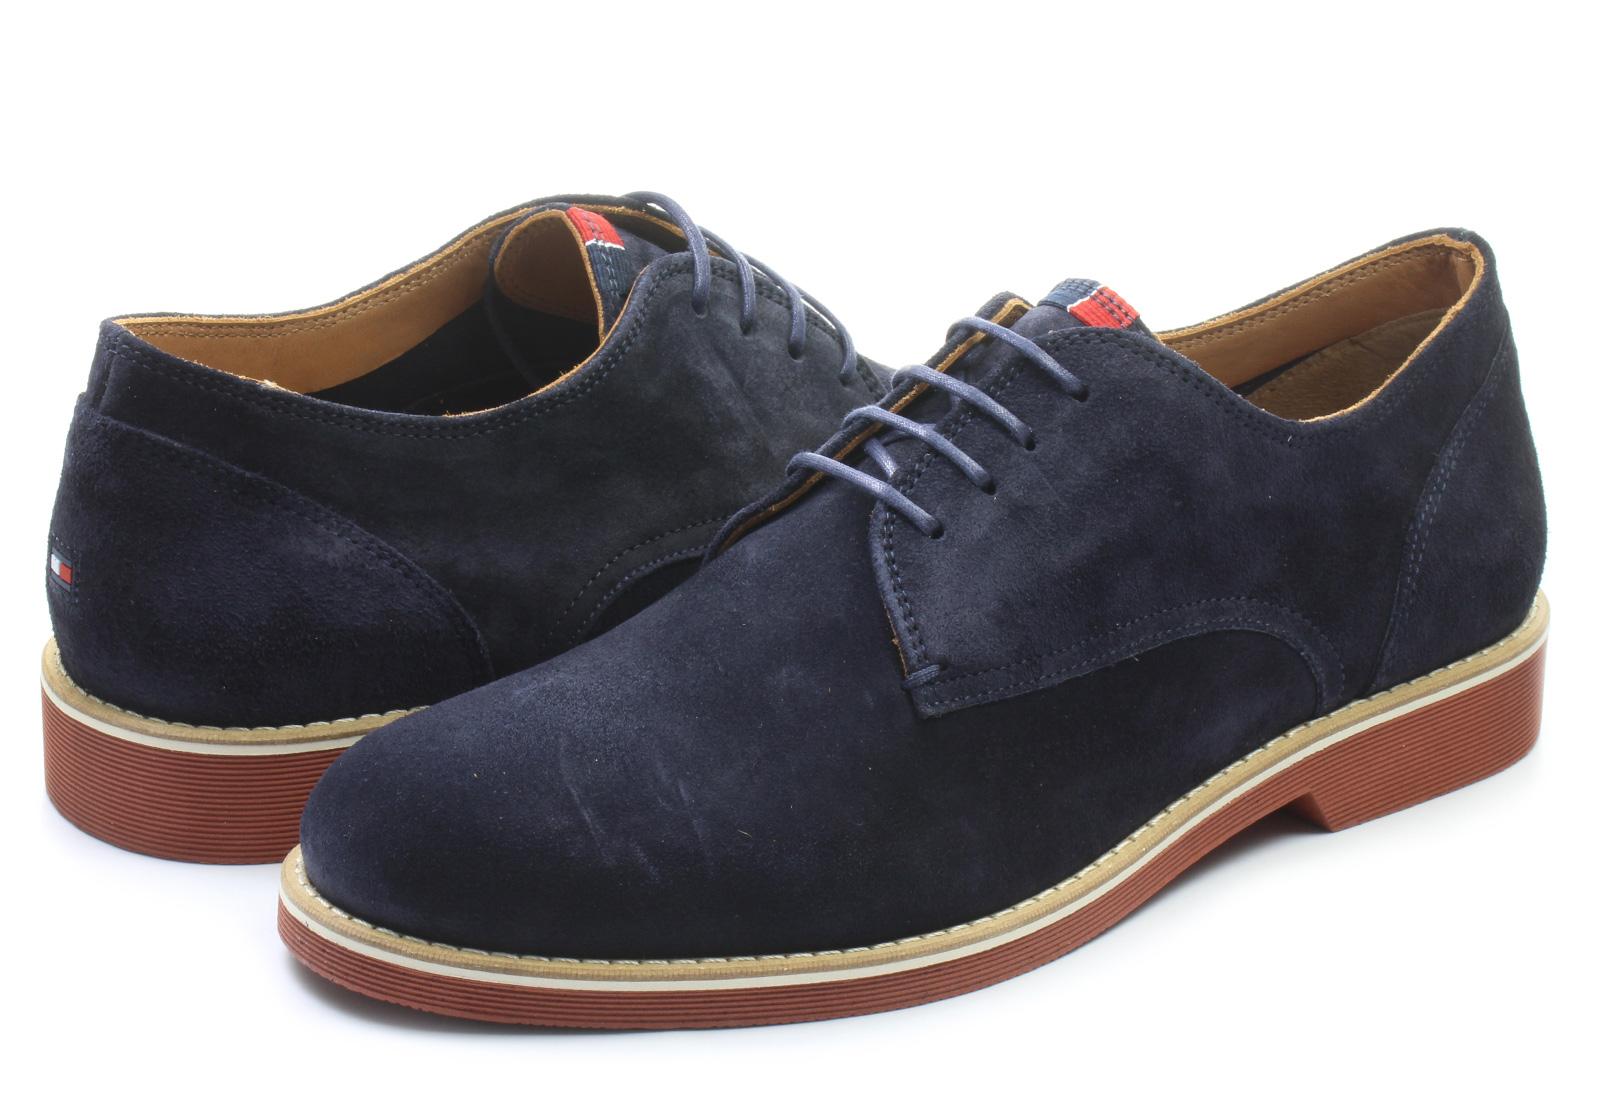 Tommy Hilfiger Cipő - Dunn 1b - 15S-8610-403 - Office Shoes Magyarország bbf040f2c4